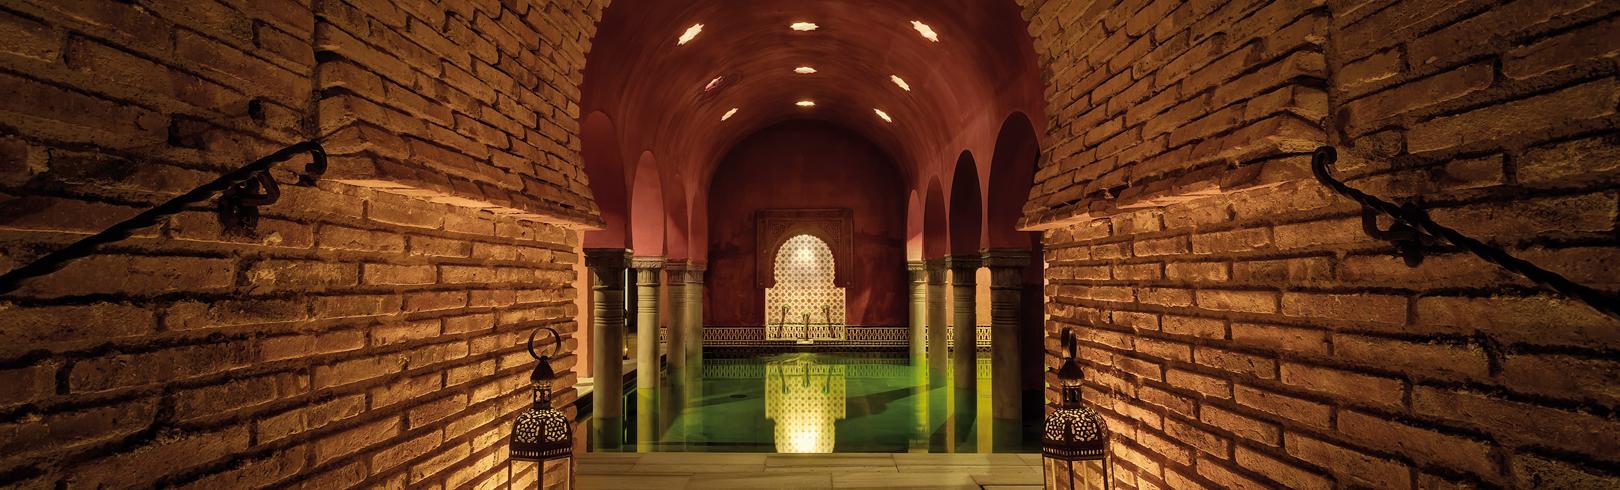 Hammam Baths